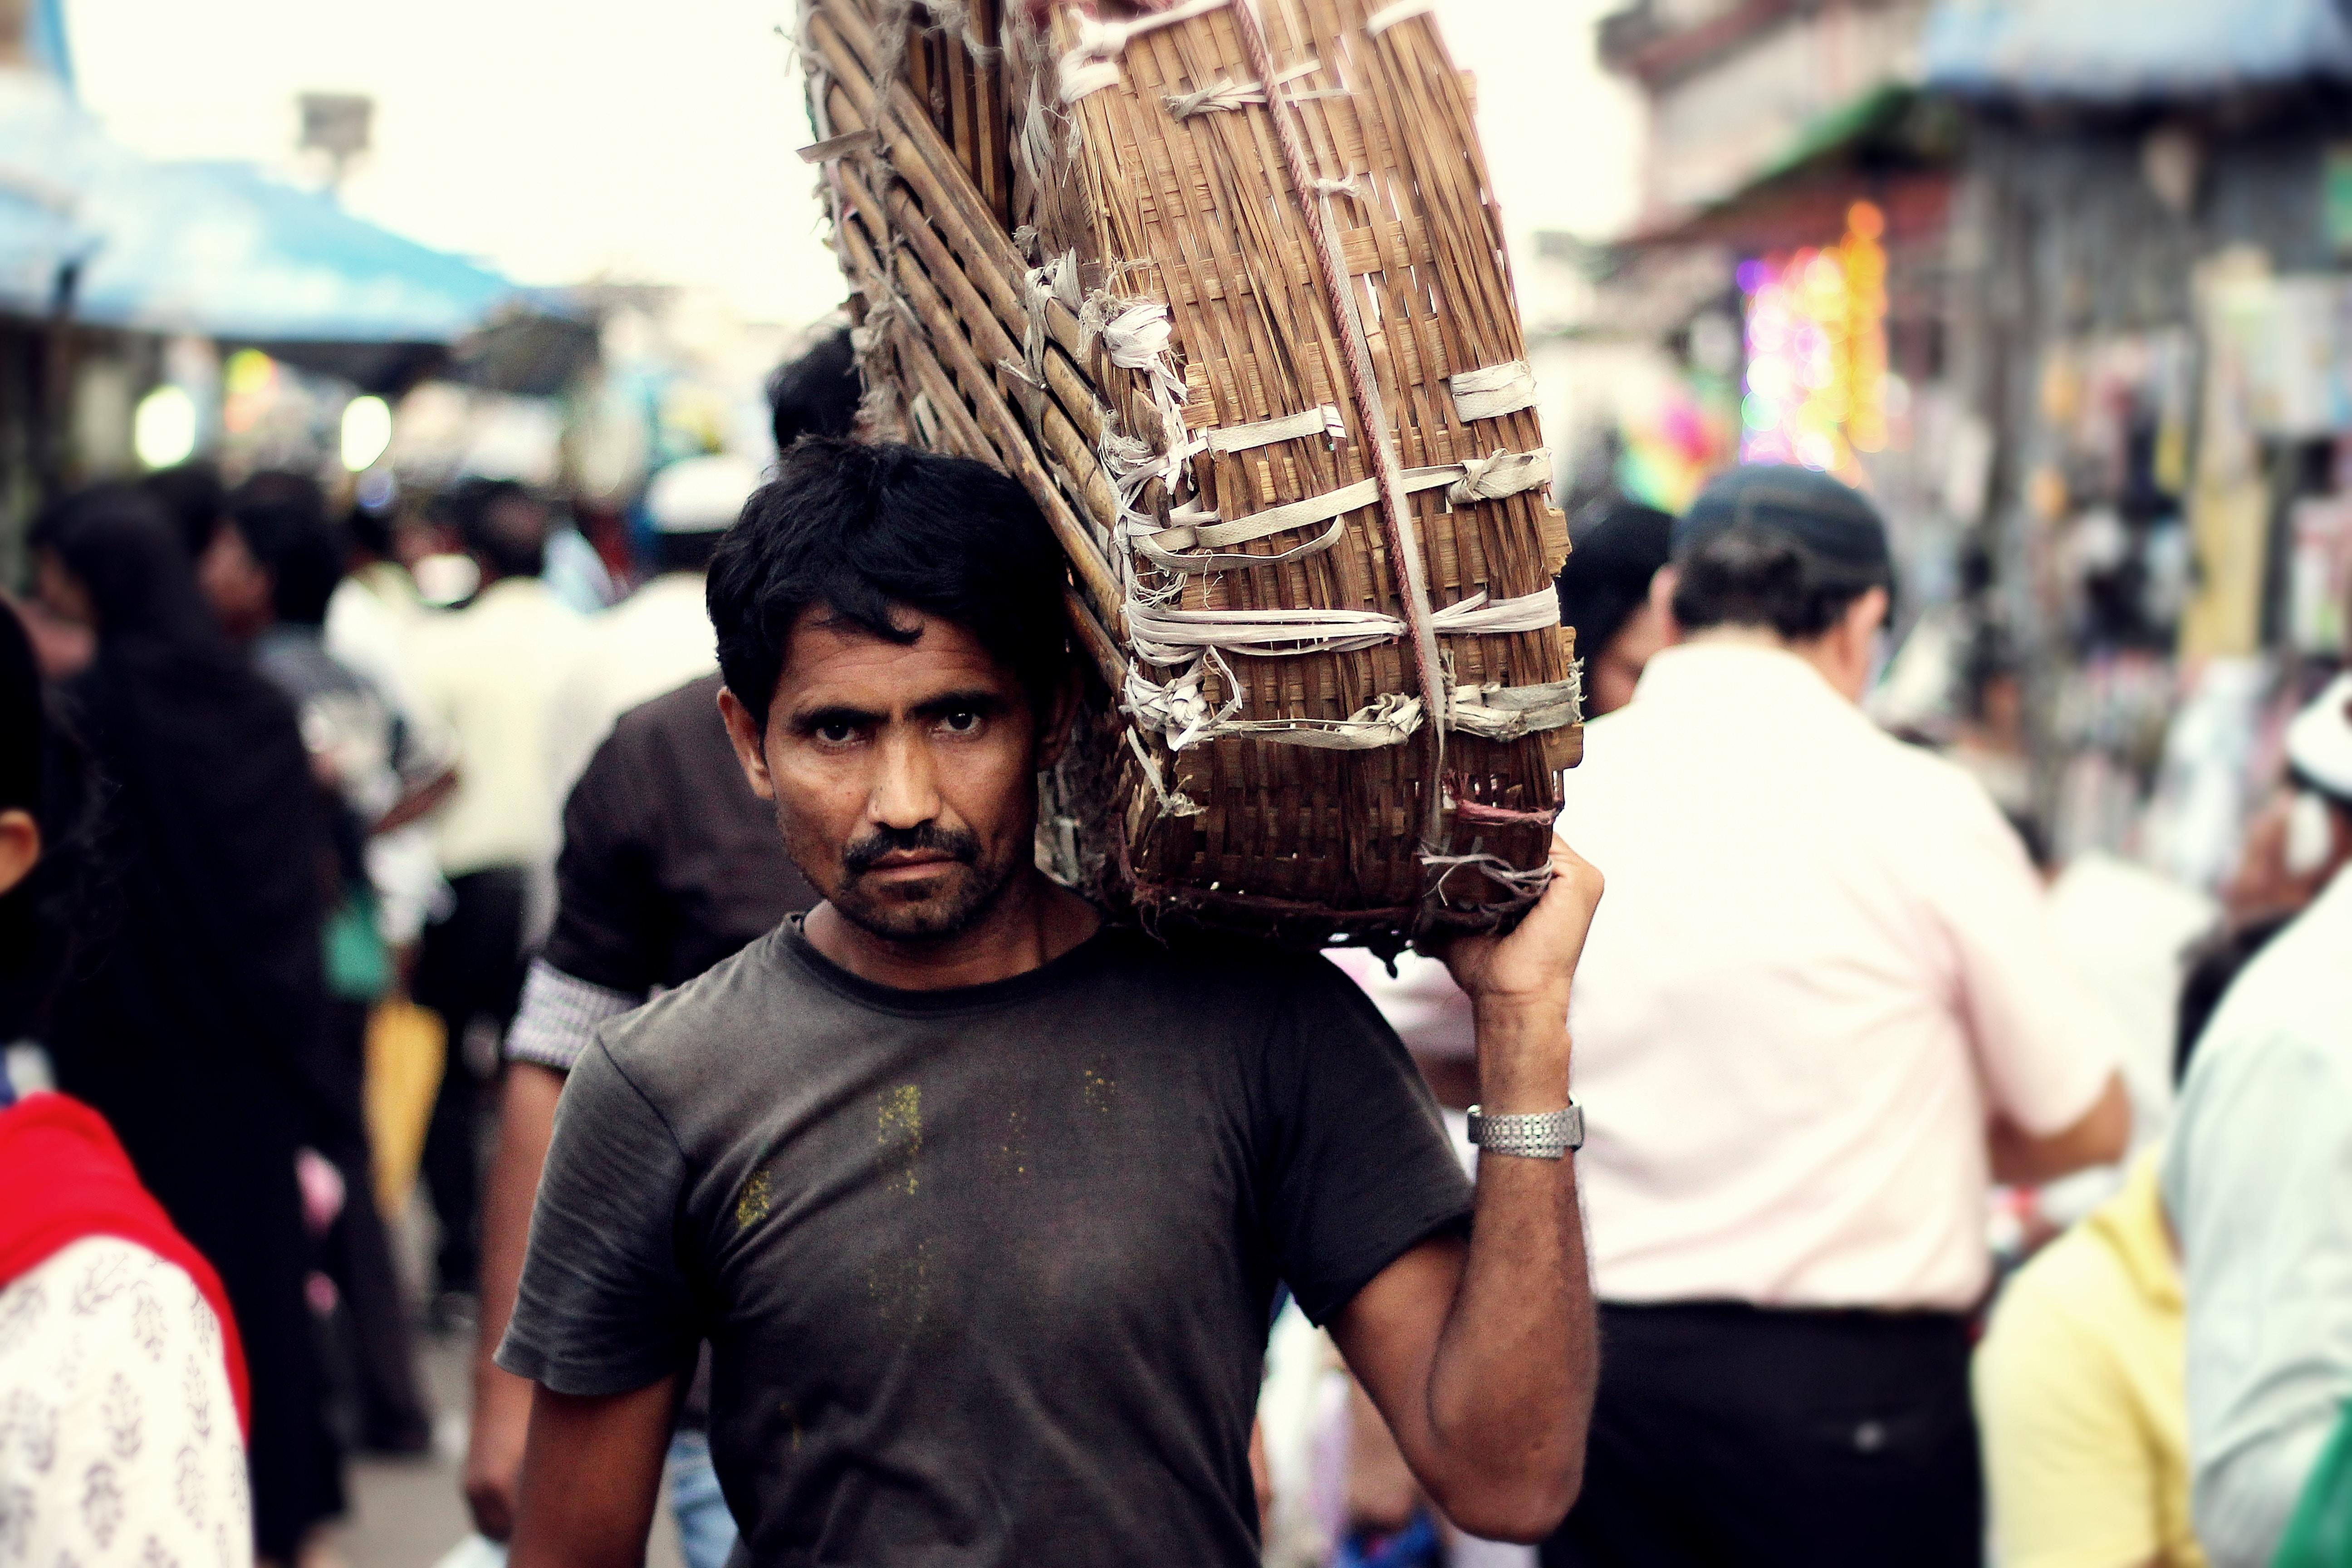 Free Unsplash photo from Himanshu Singh Gurjar